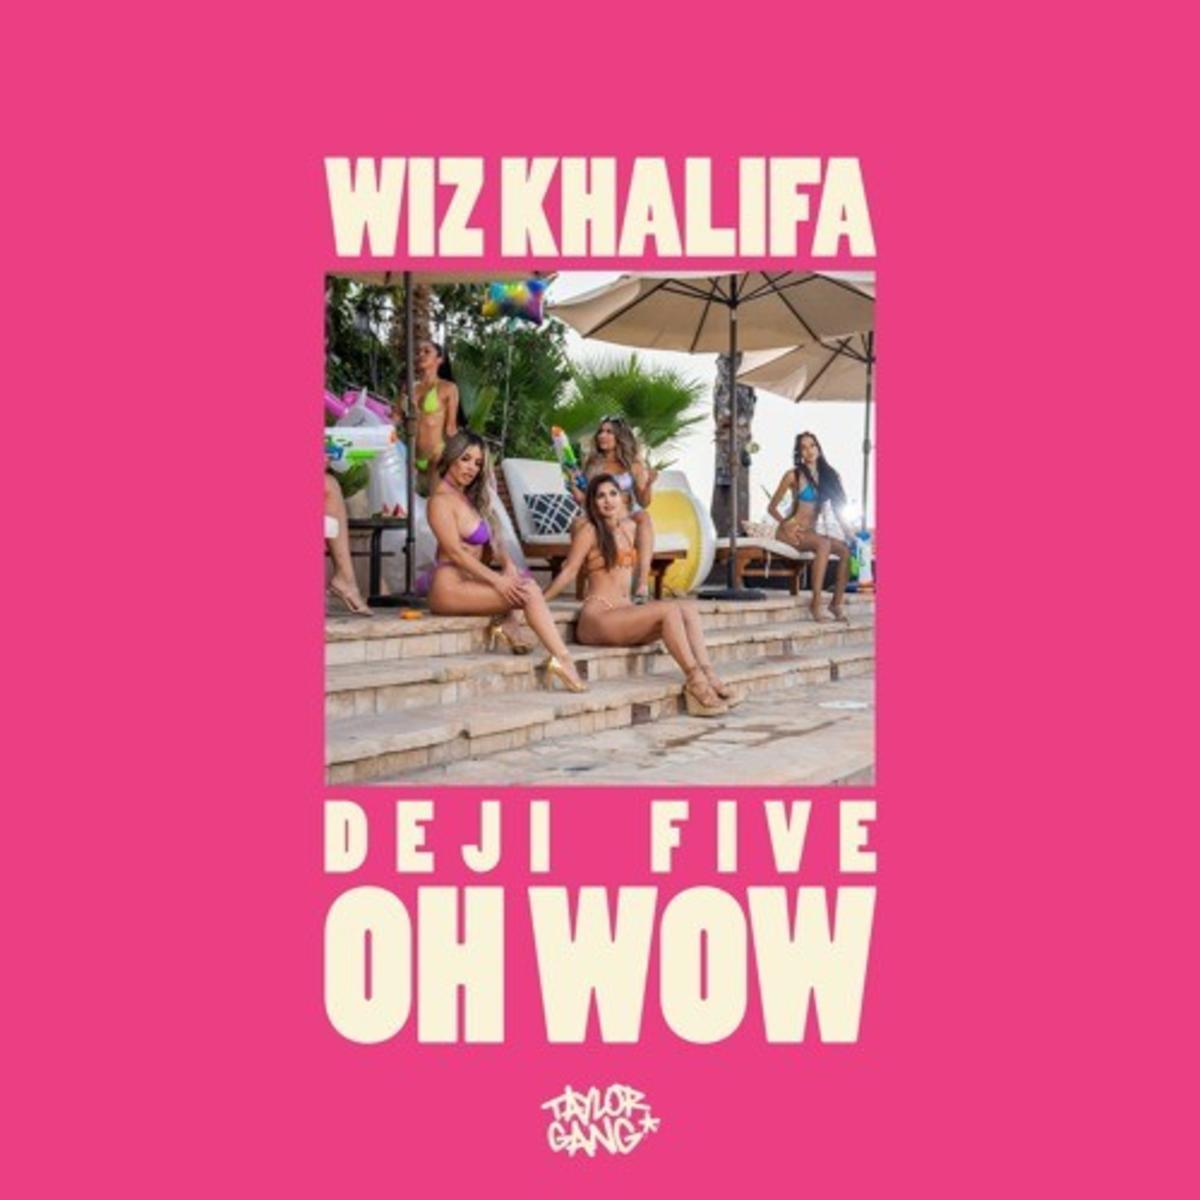 MP3: Taylor Gang - Oh Wow Ft. Wiz Khalifa, Young Deji & Feezy